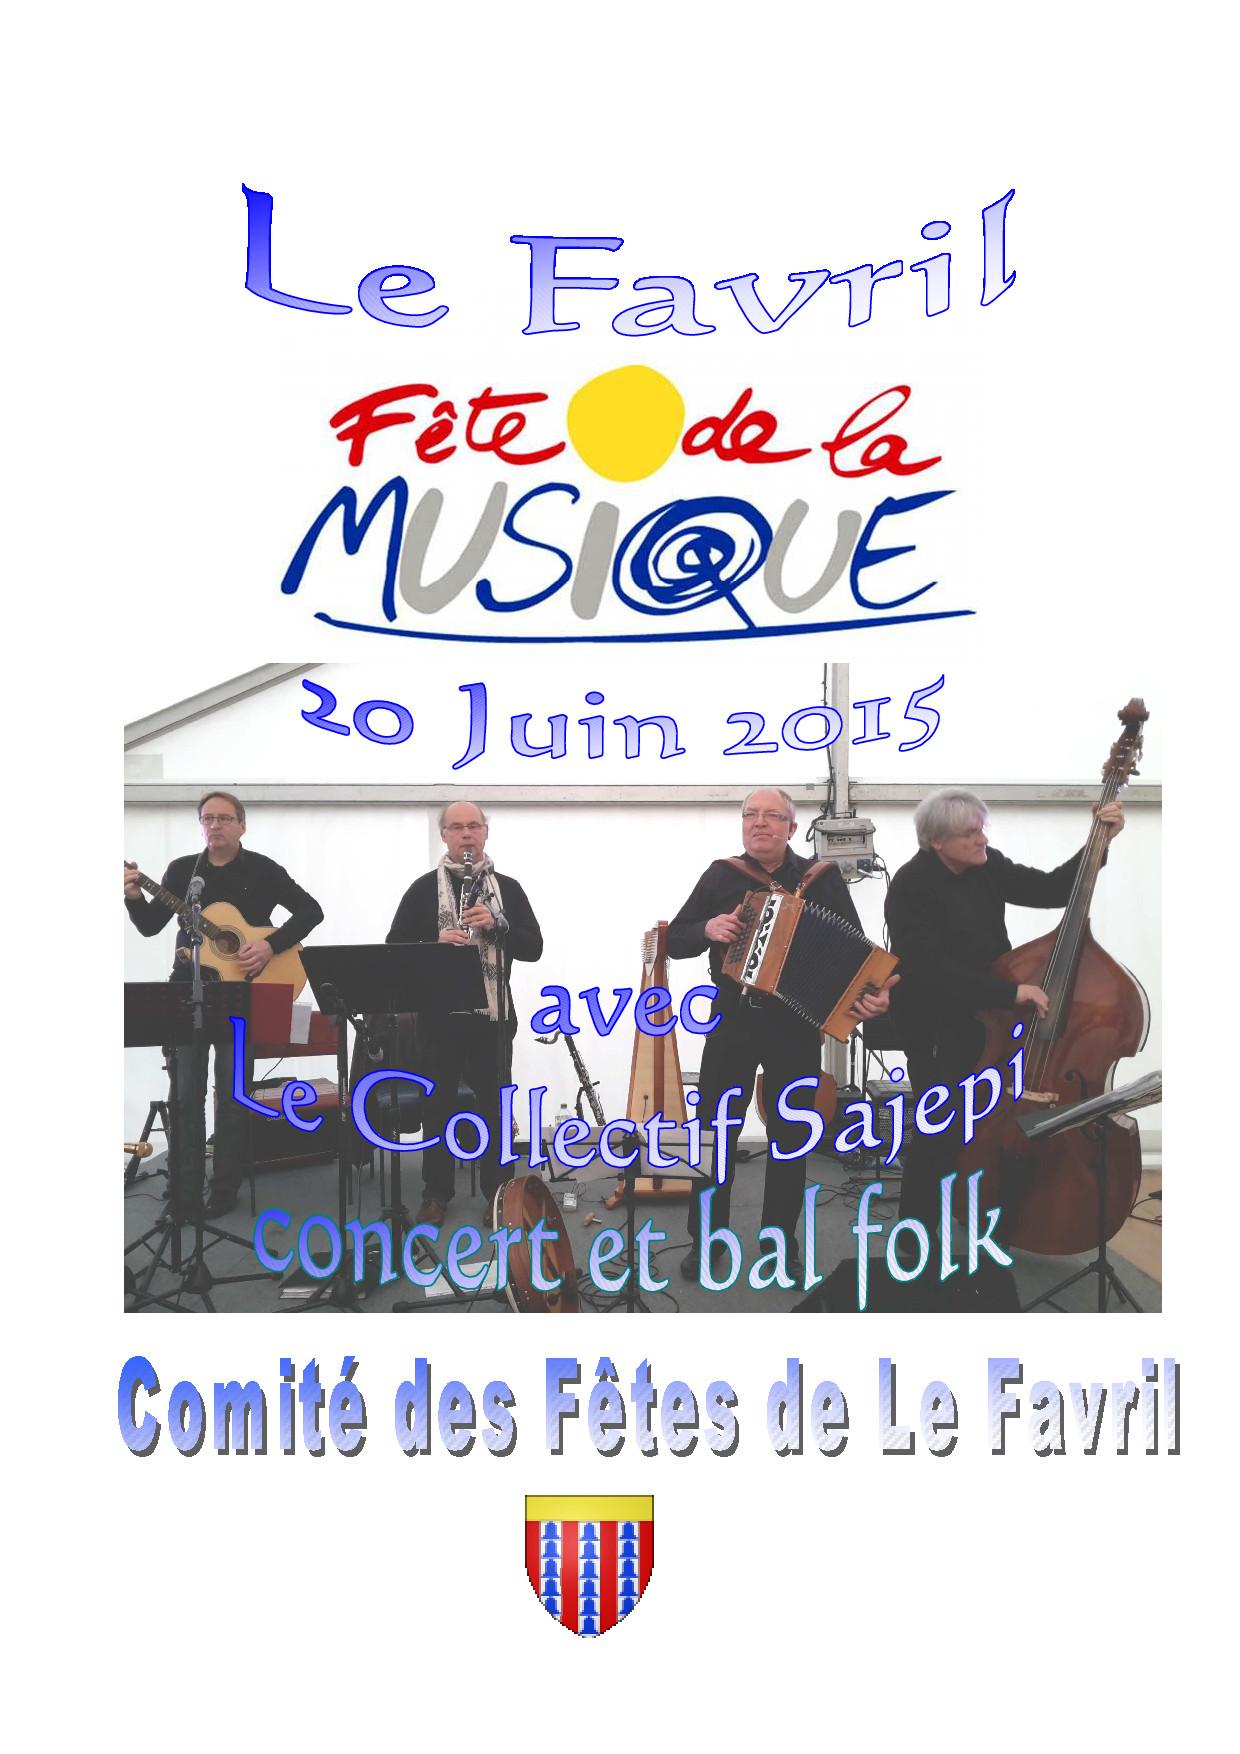 Affiche Bal folk concert et bal folk à Le Favril